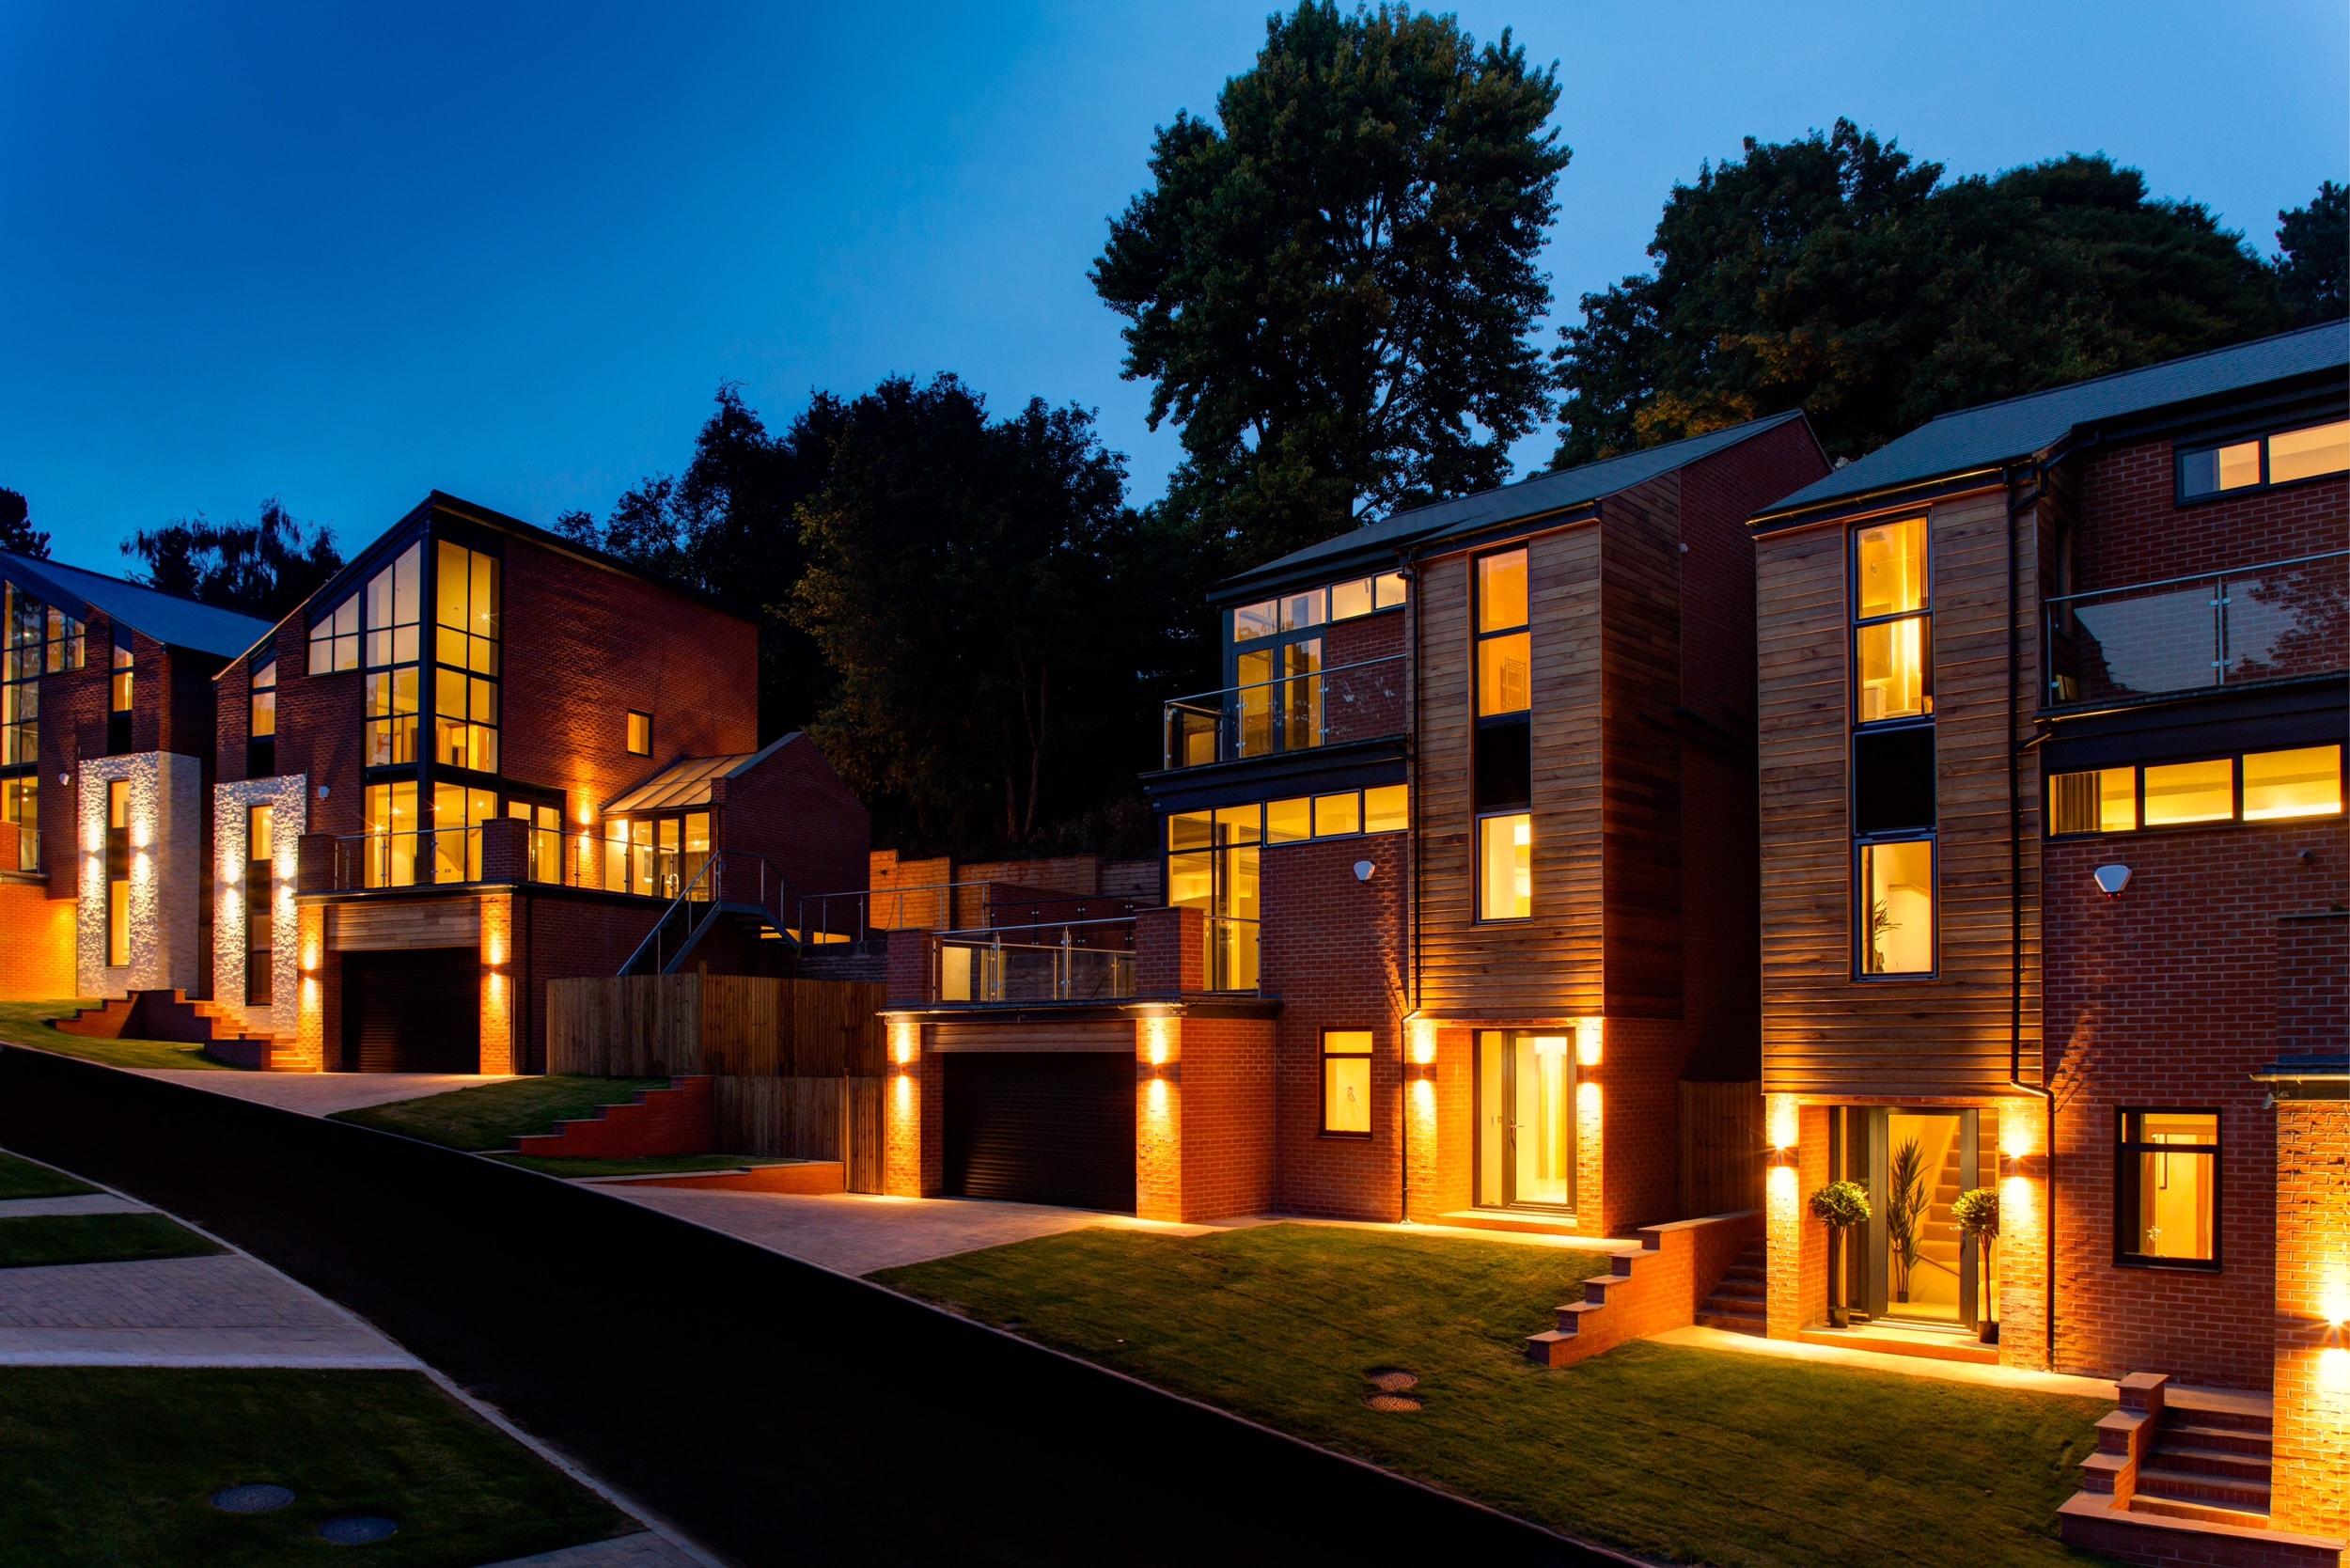 The Crescent at Alexandra Park, luxury homes from bespoke home developer, Guy Phoenix